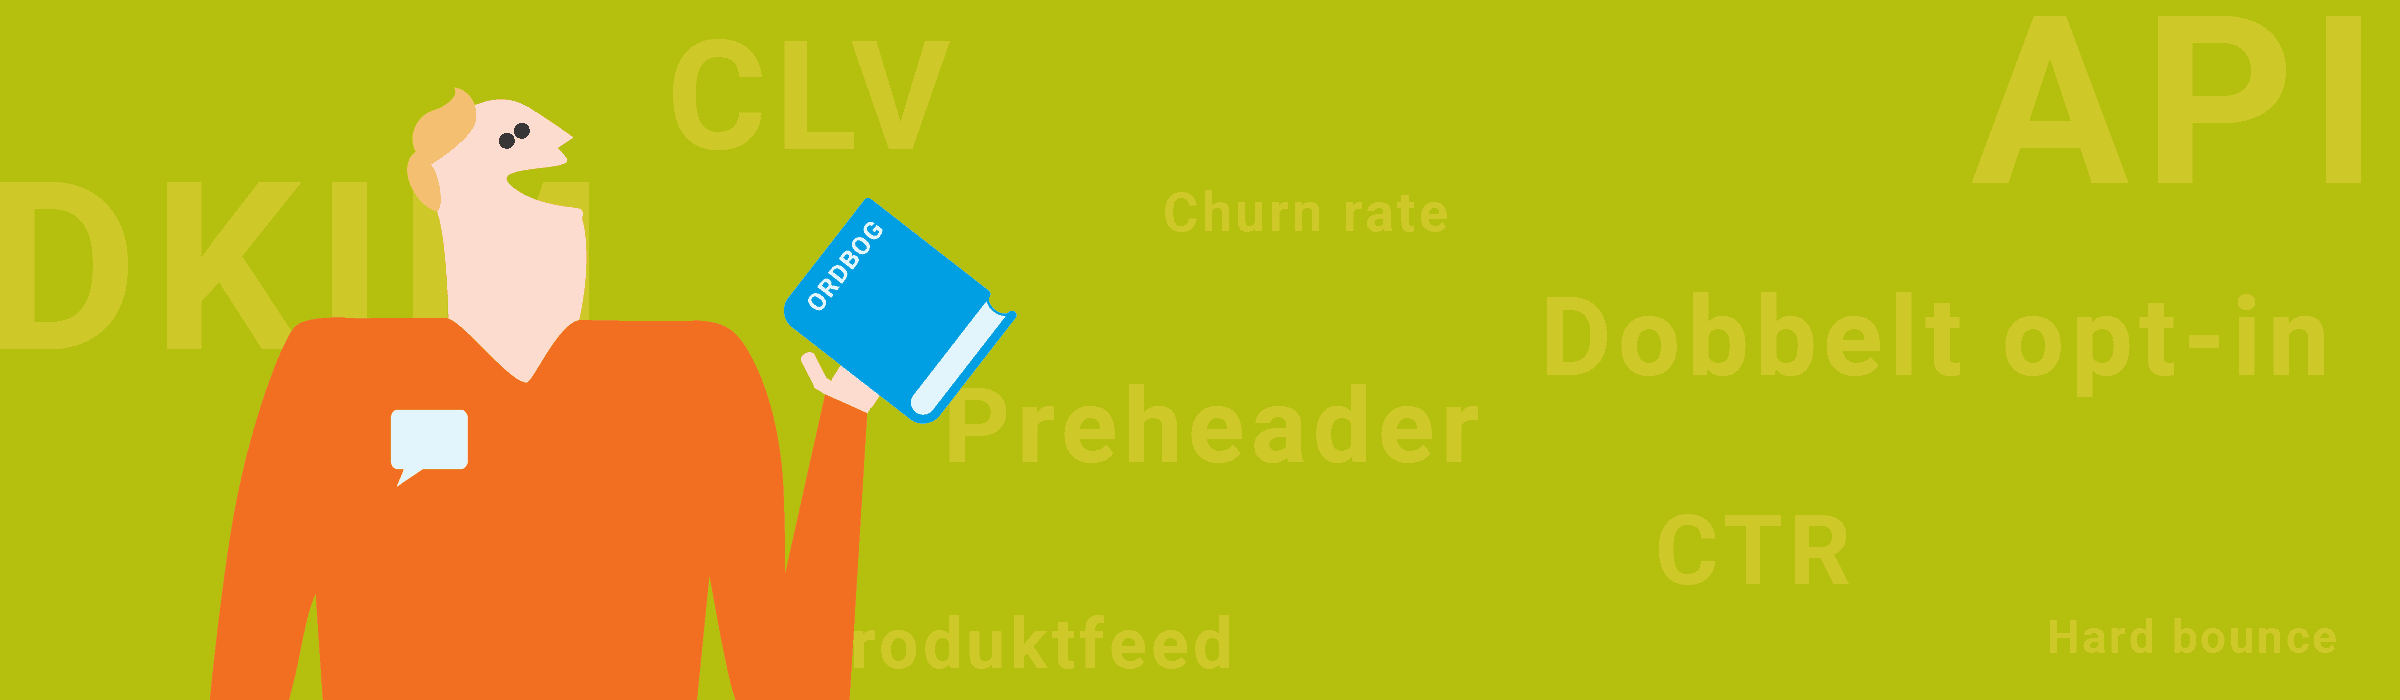 e-mail marketing ordbog